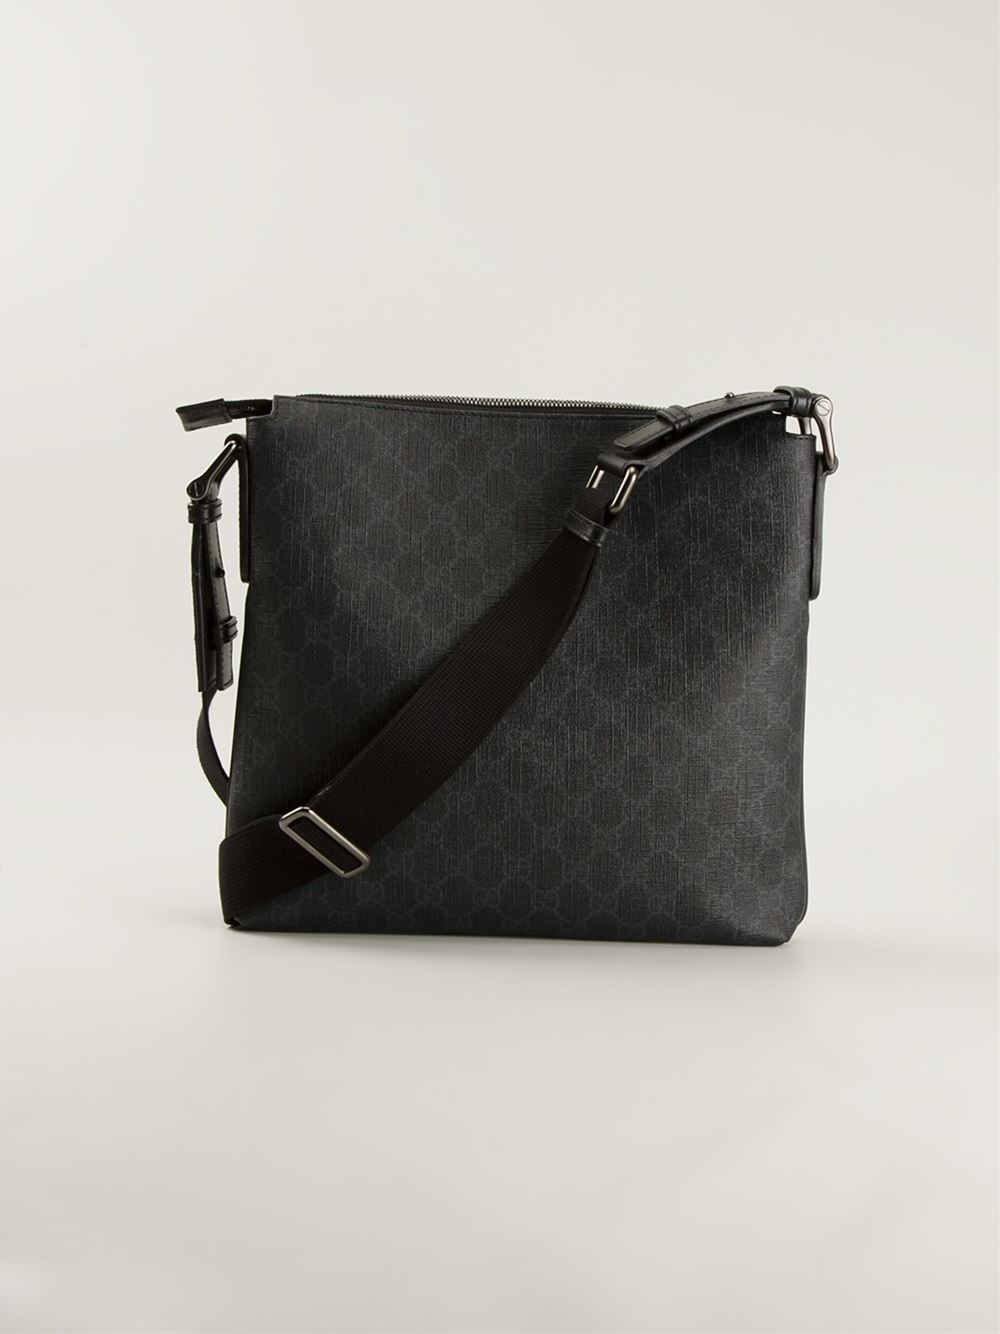 b1ad0e3520e702 Gucci Monogram Messenger Bag in Black for Men - Lyst